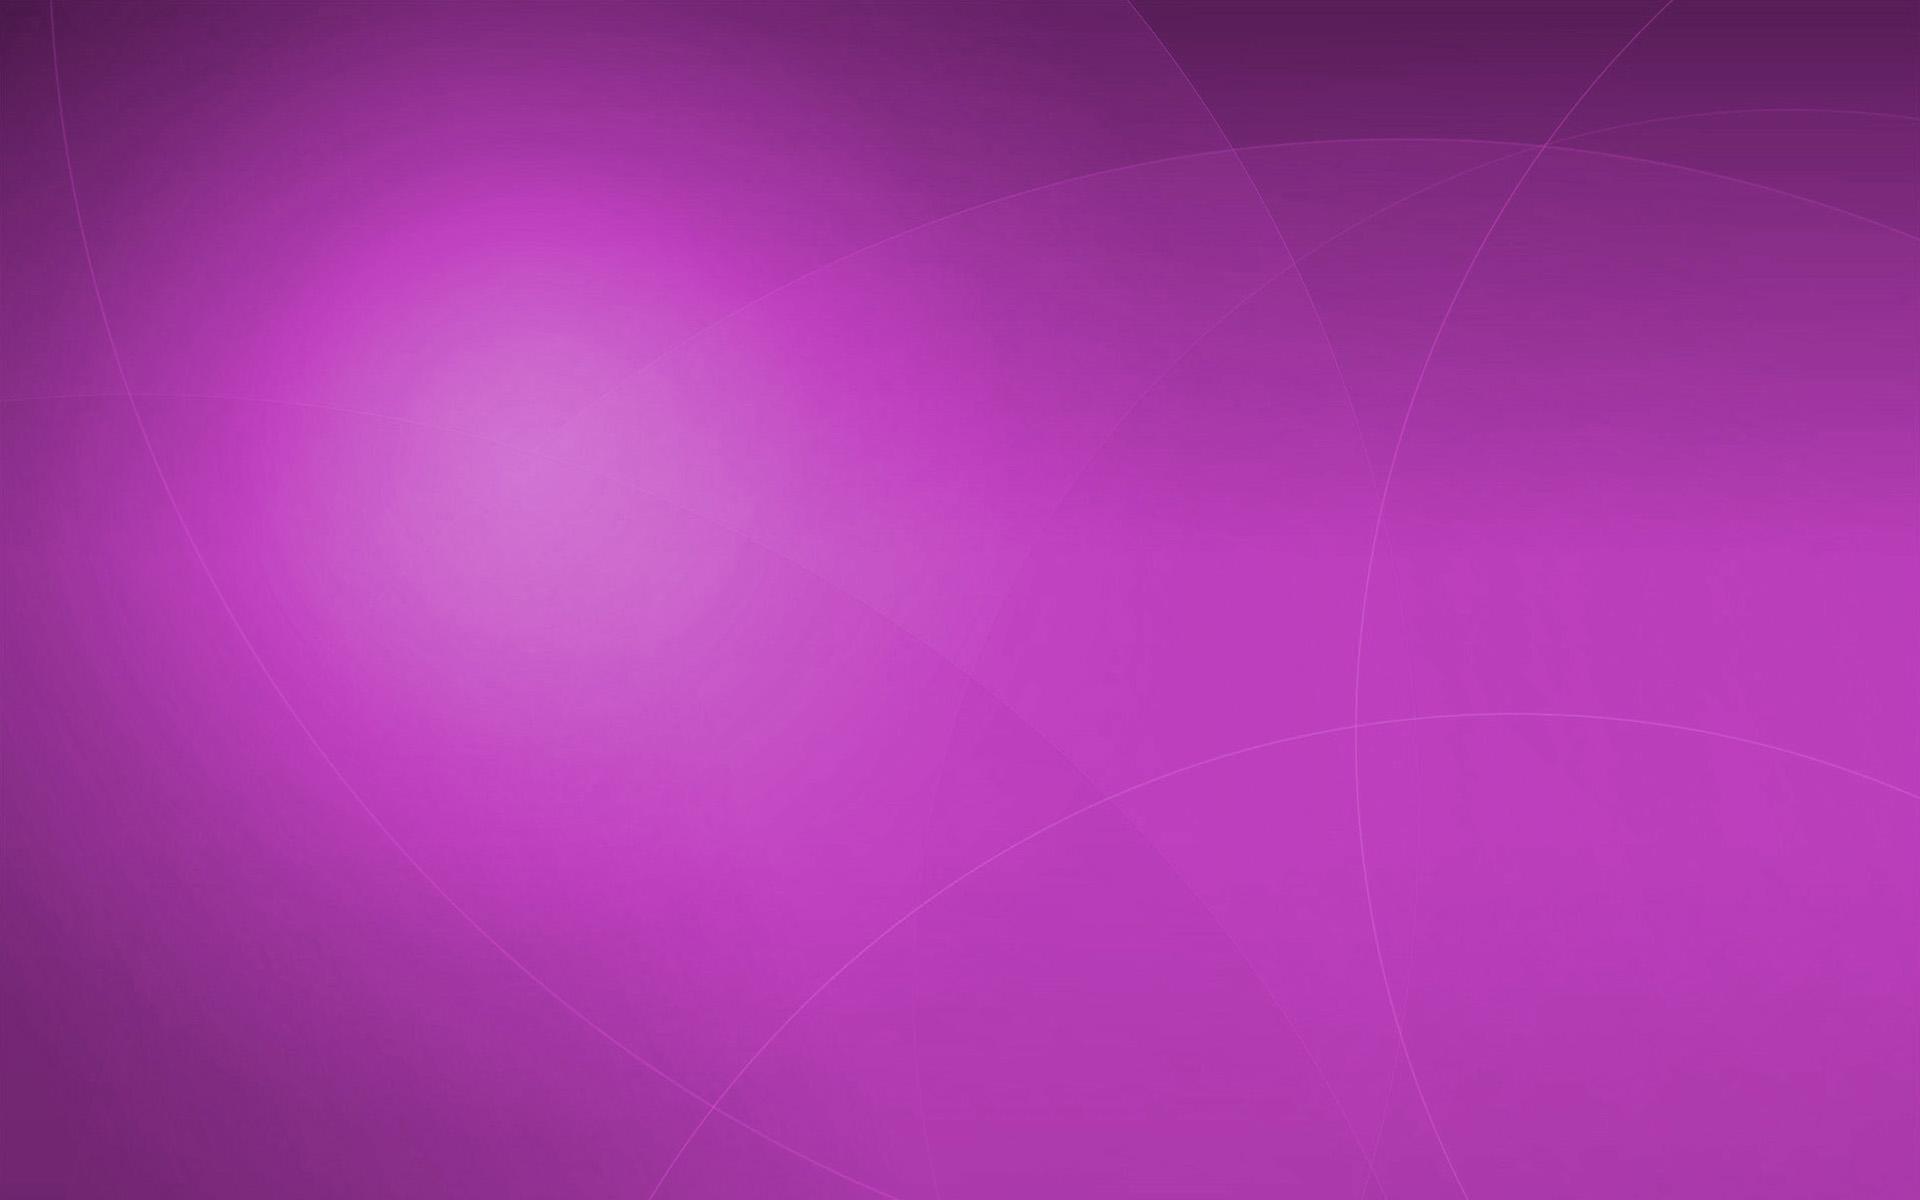 75+] Purple Background Image on WallpaperSafari